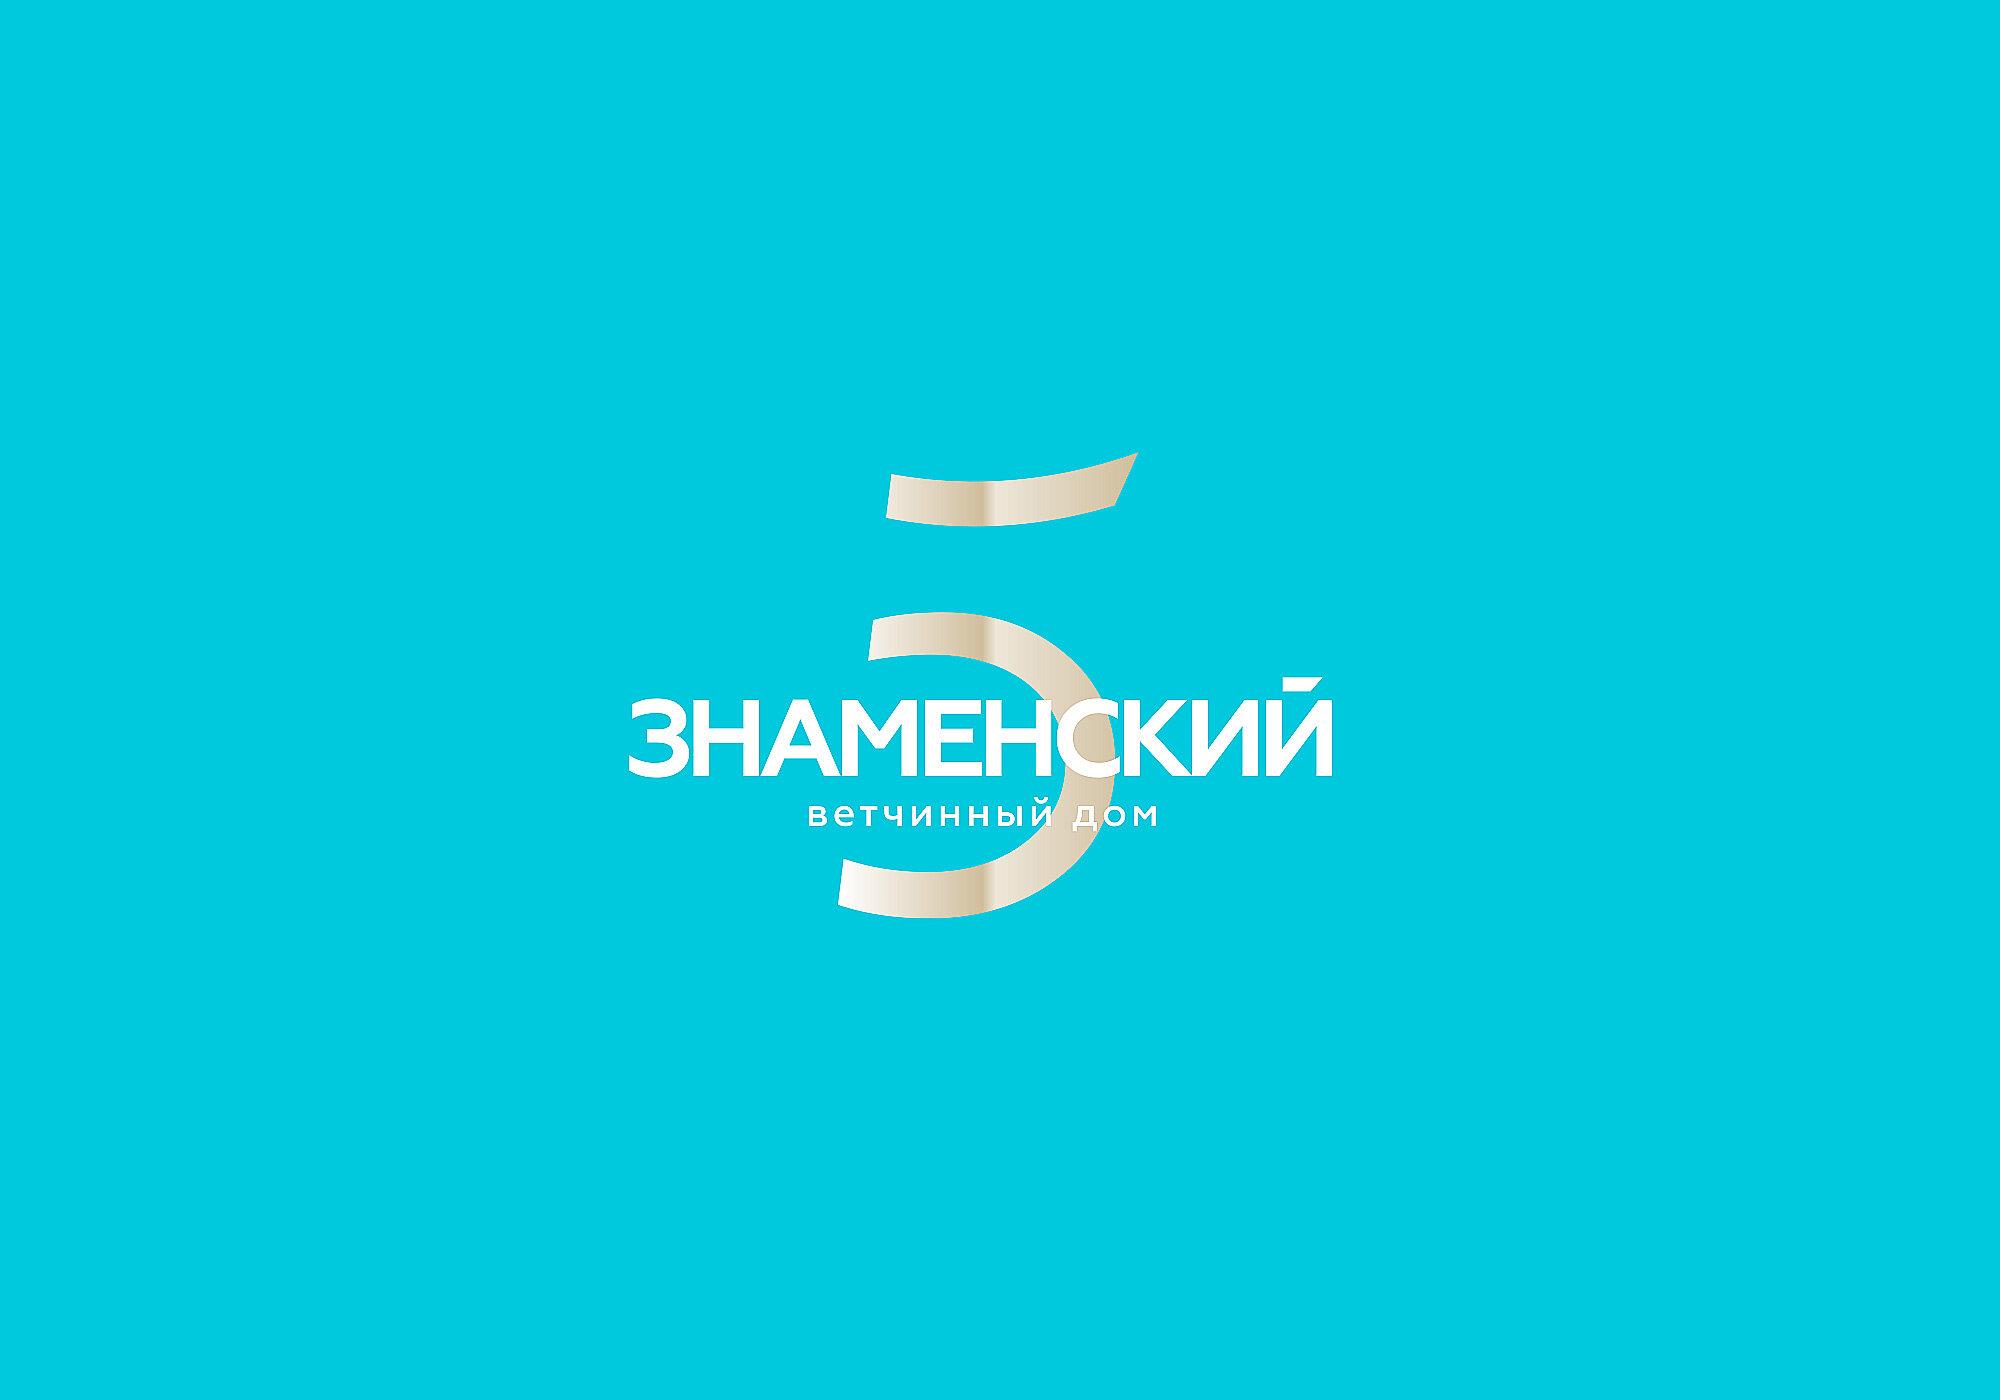 bqb_znamensky_packaging_logo.jpg